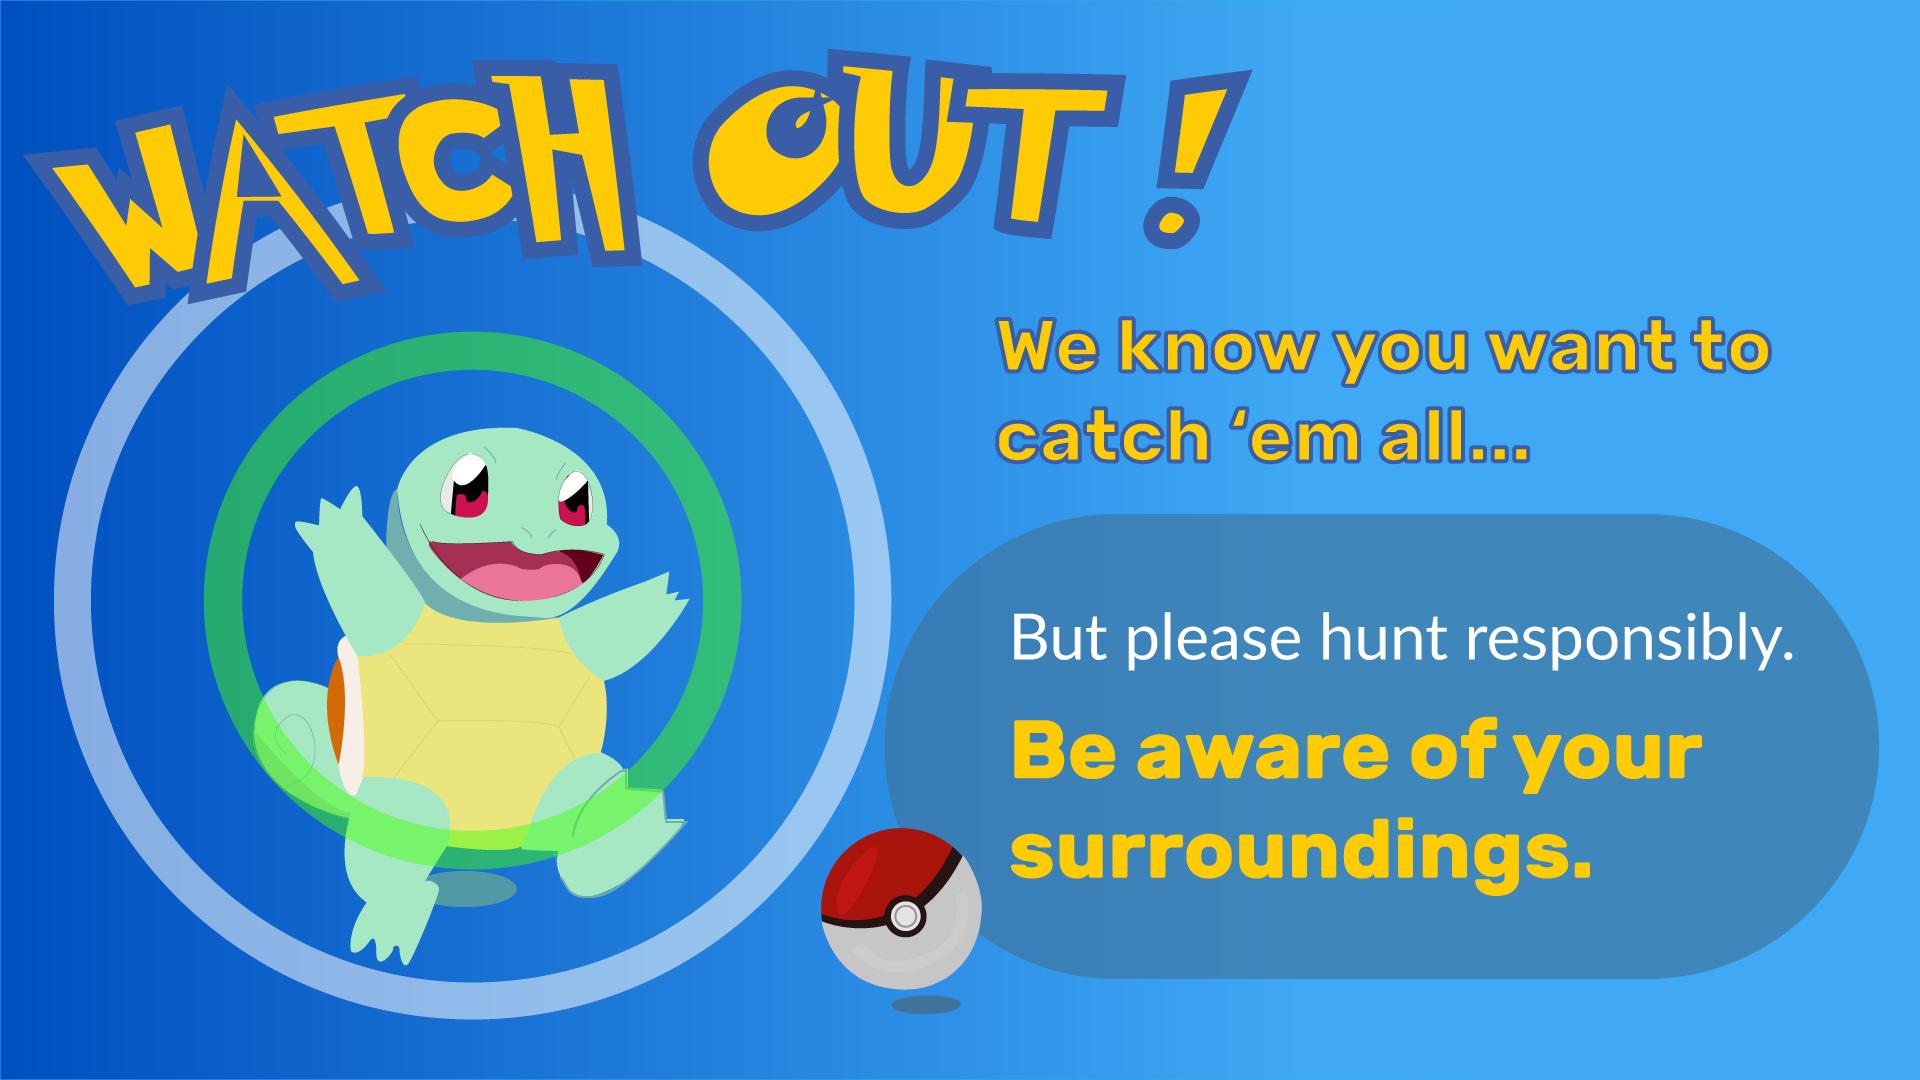 free digital signage templates pokémon go